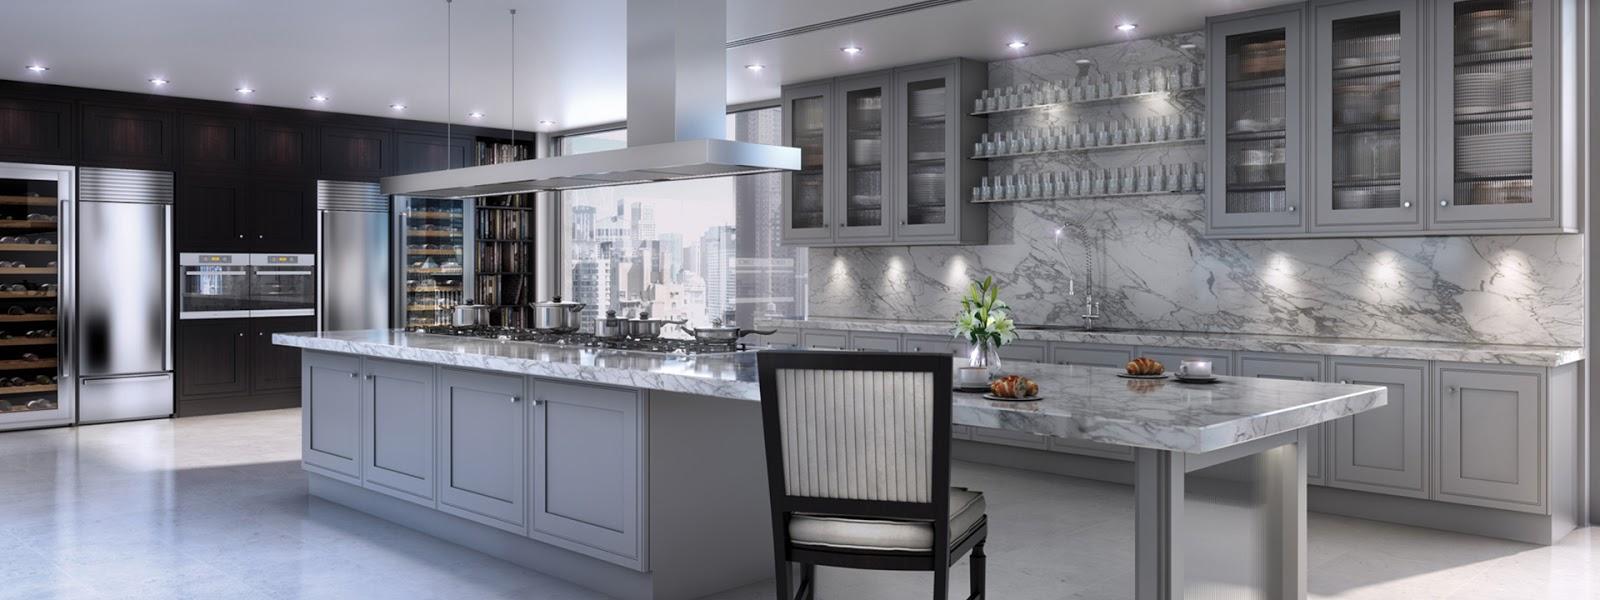 Ikoyi elite clive christian luxury kitchen for Clive christian kitchen designs